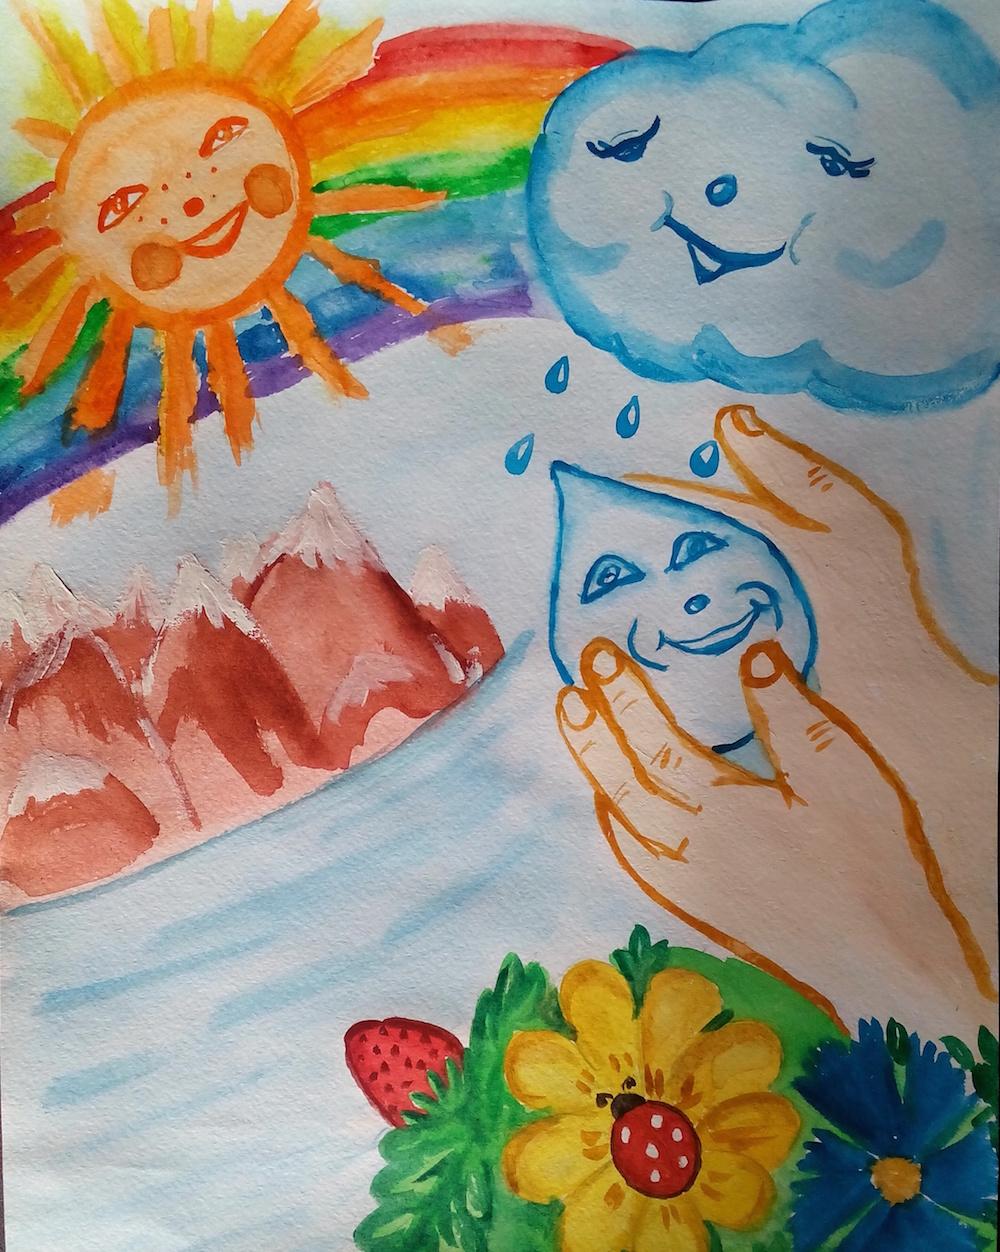 Новосёлова Ксения.Сохраним воду на планете!